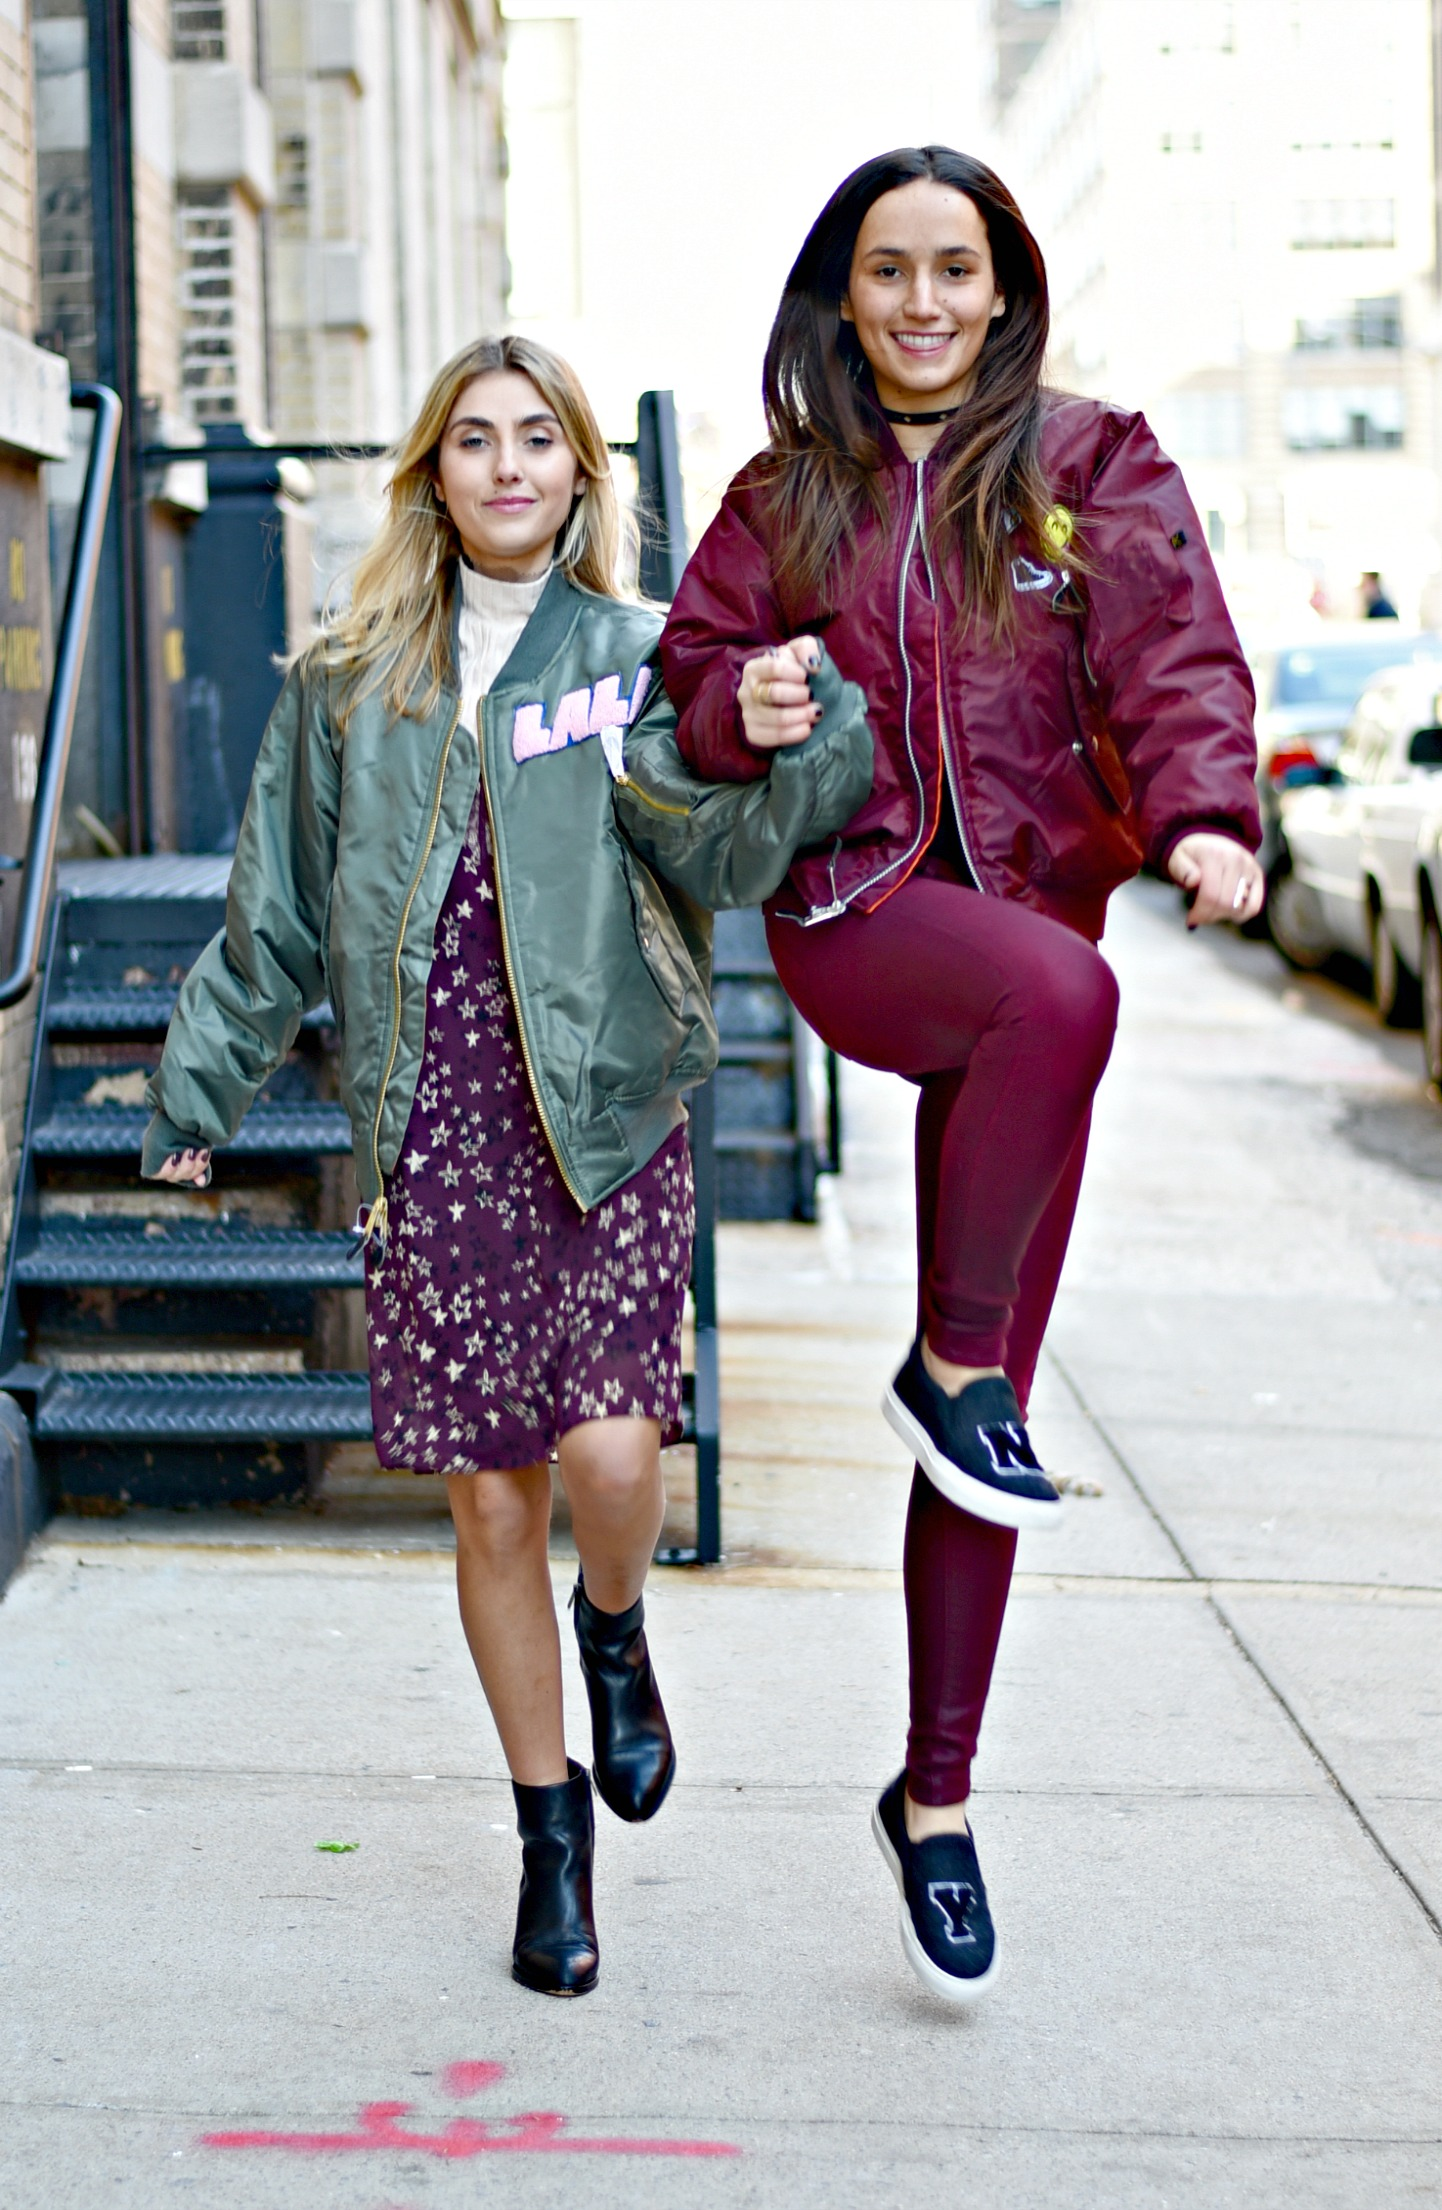 SOPHIE & CHARLOTTE BICKLEY YIN 2MY YANG SISTER FASHION BLOGGERS NYC UNEMPLOYED DENIM POST 1l.jpg